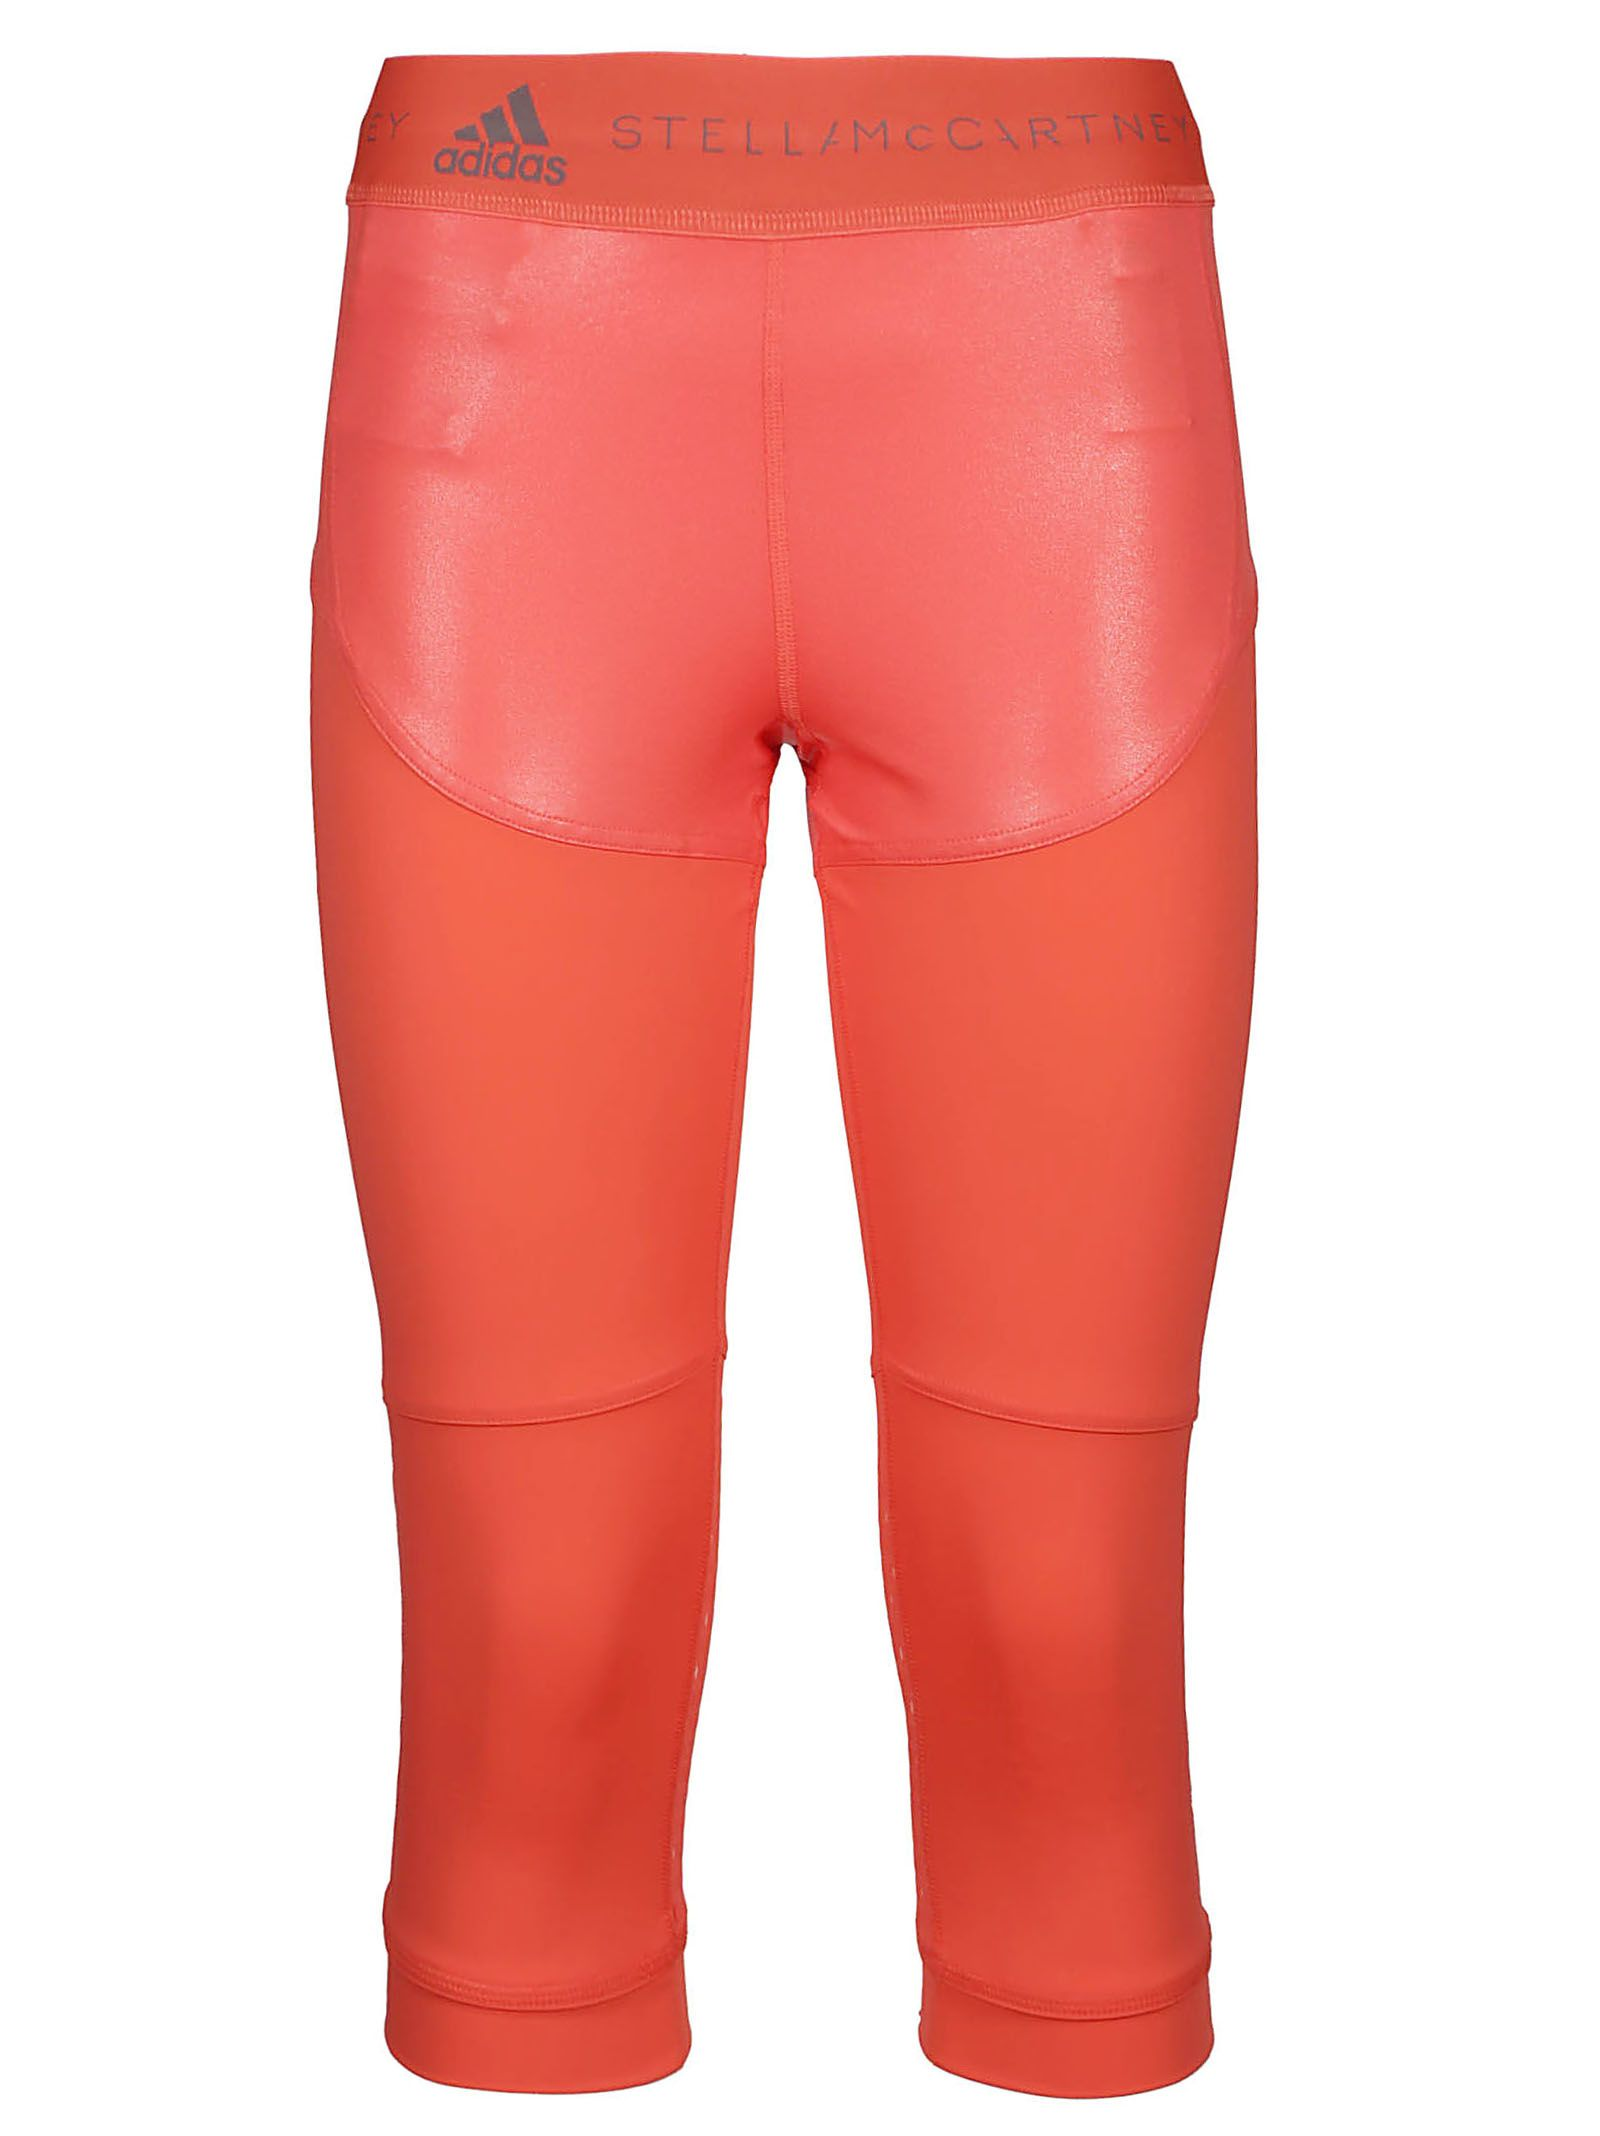 d6305bdac59b6 Adidas by Stella McCartney Run Three Quarter Leggings - Hot Coral ...